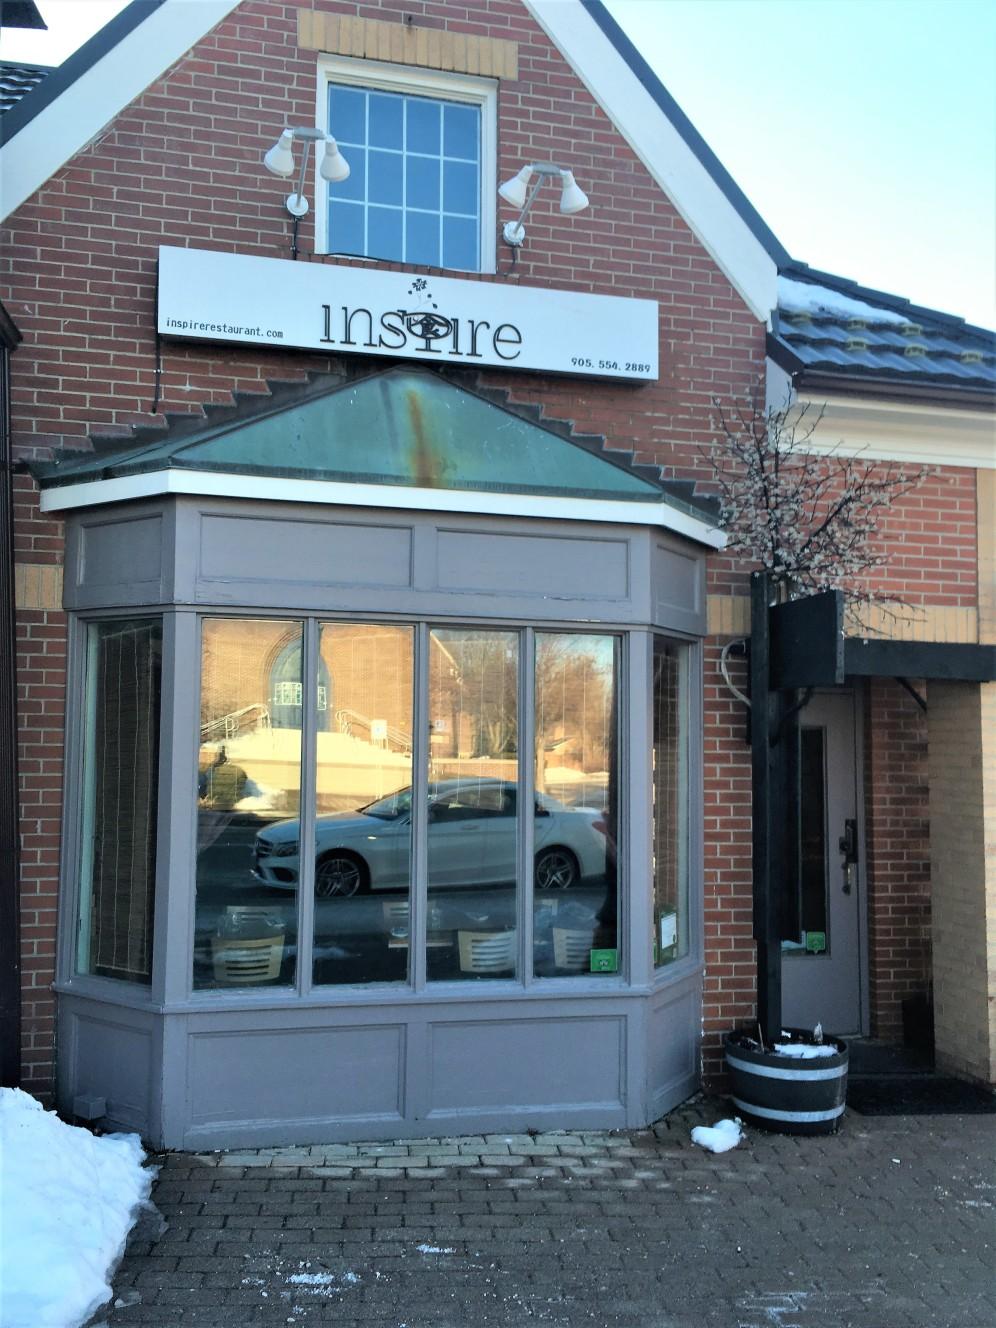 Fusion Restaurant - Went last year, nice spot